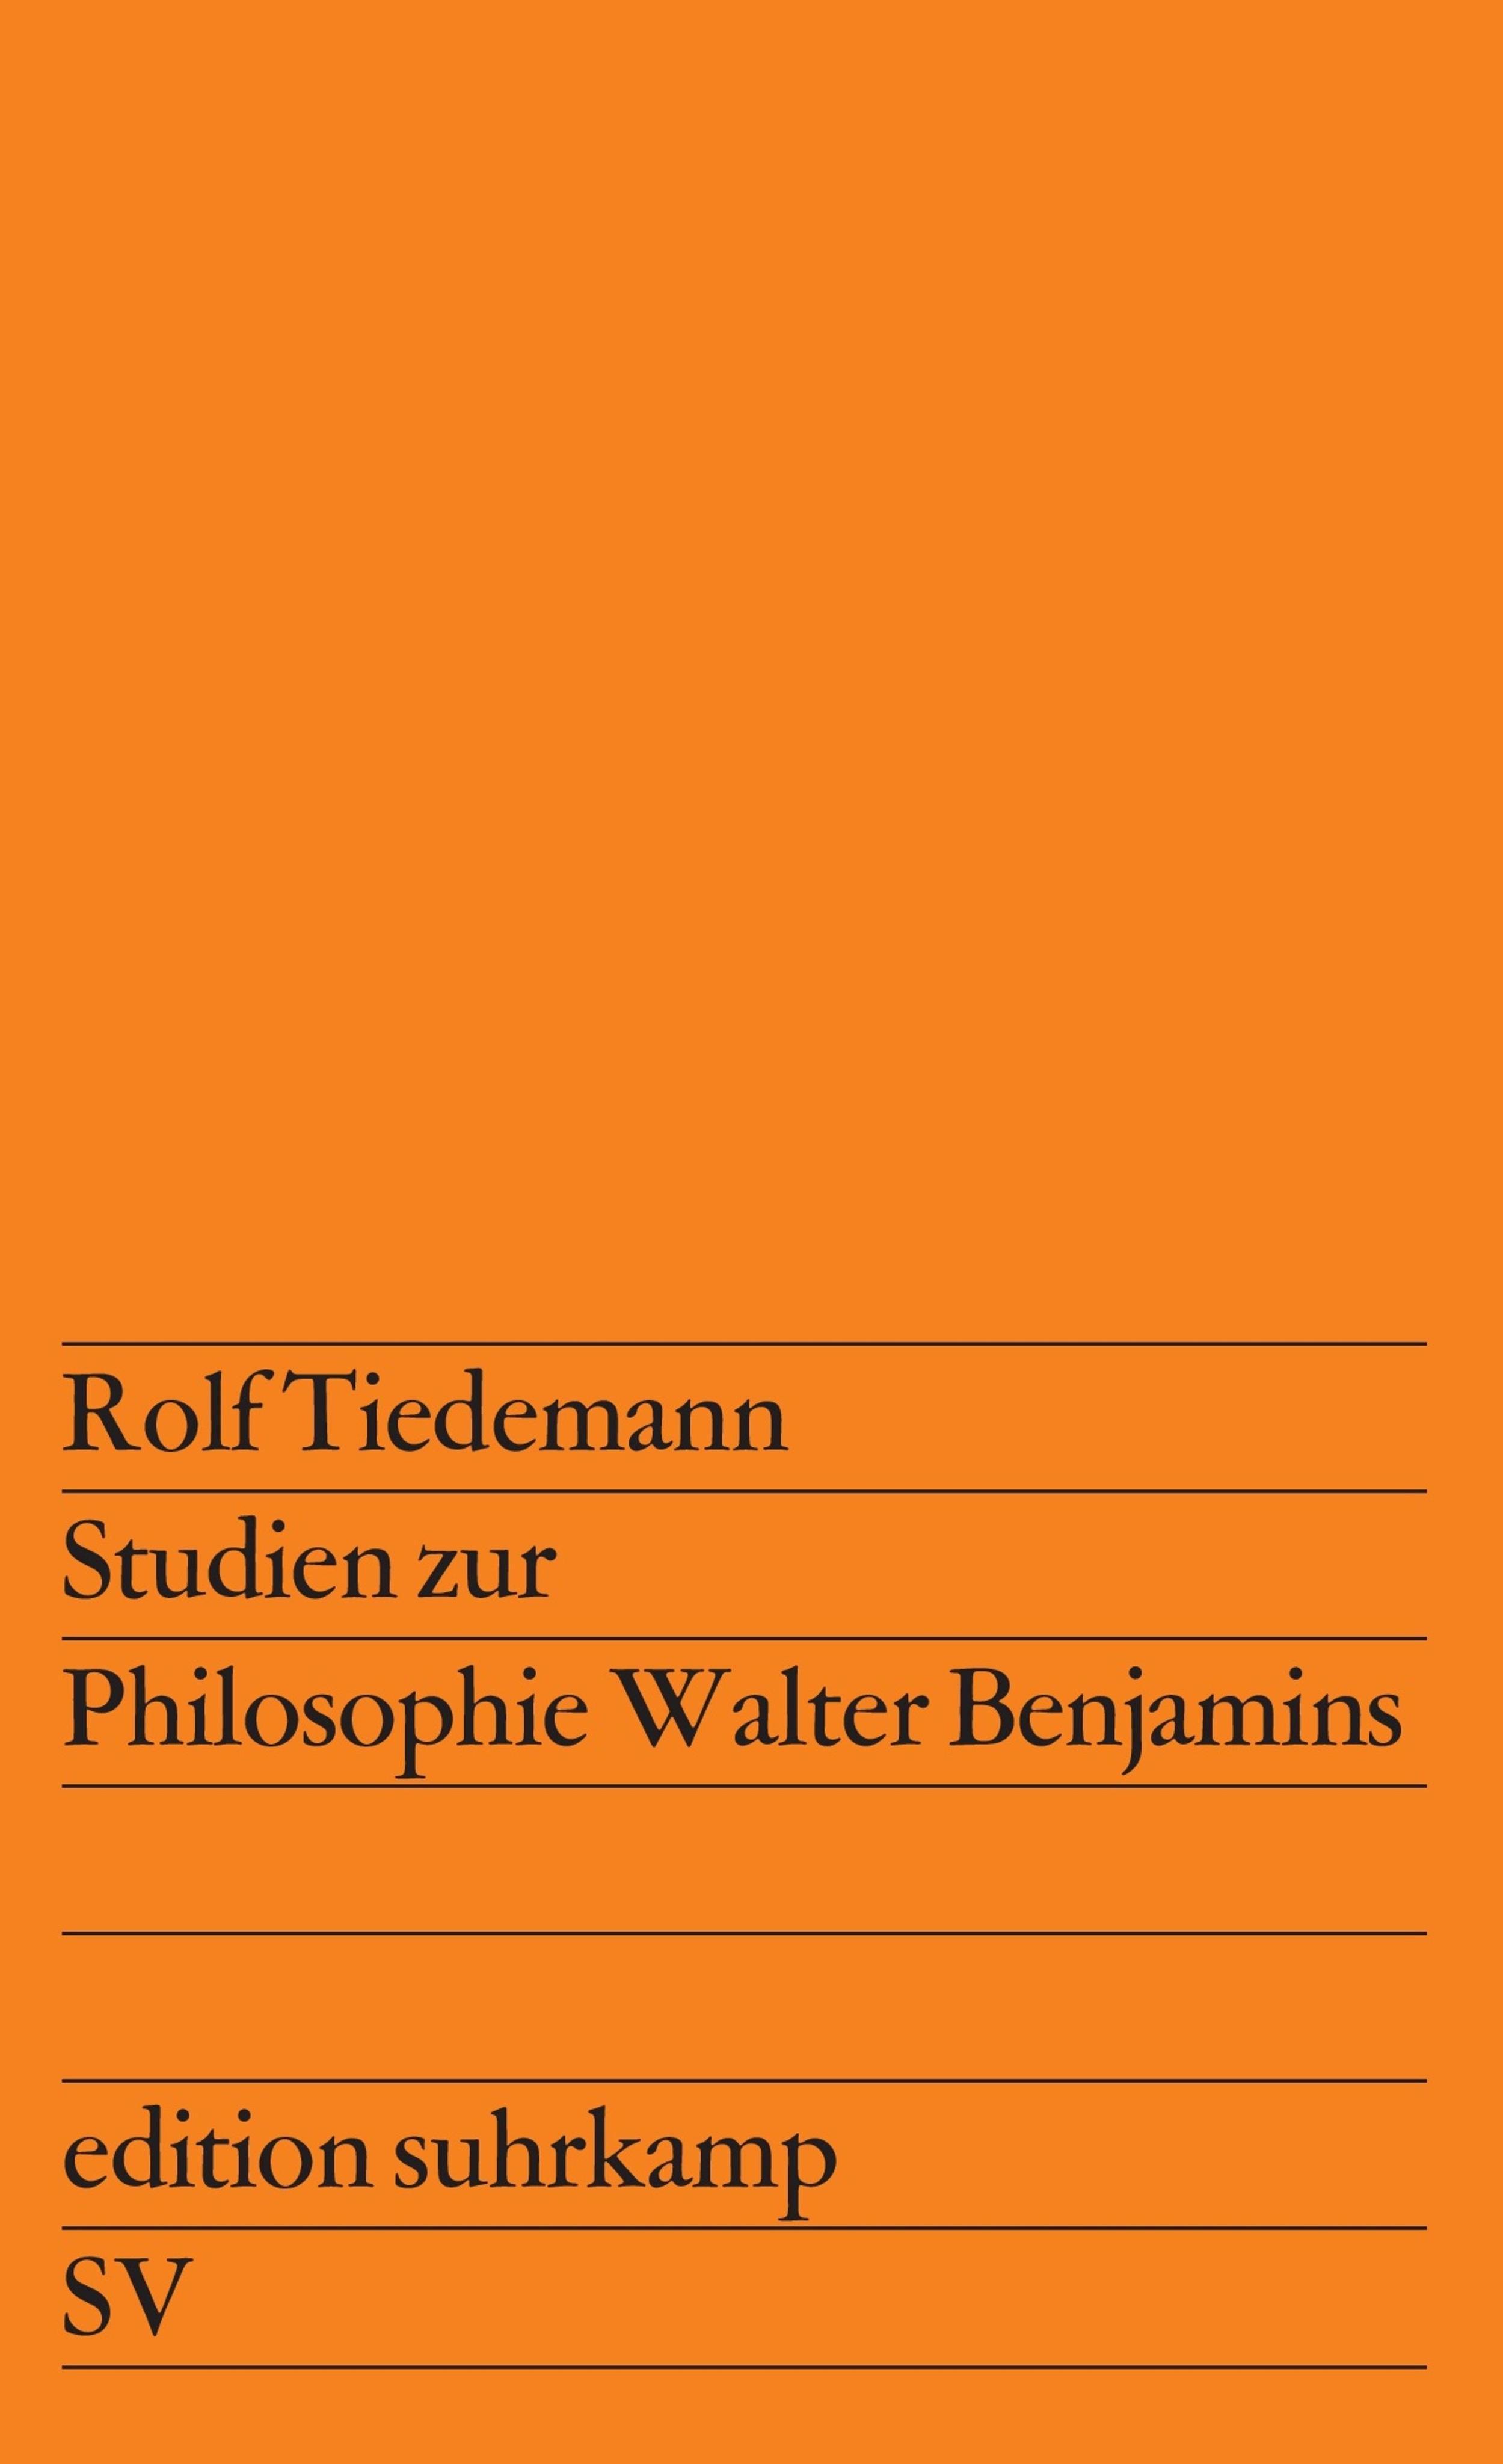 Studien zur Philosophie Walter Benjamins Rolf Tiedemann